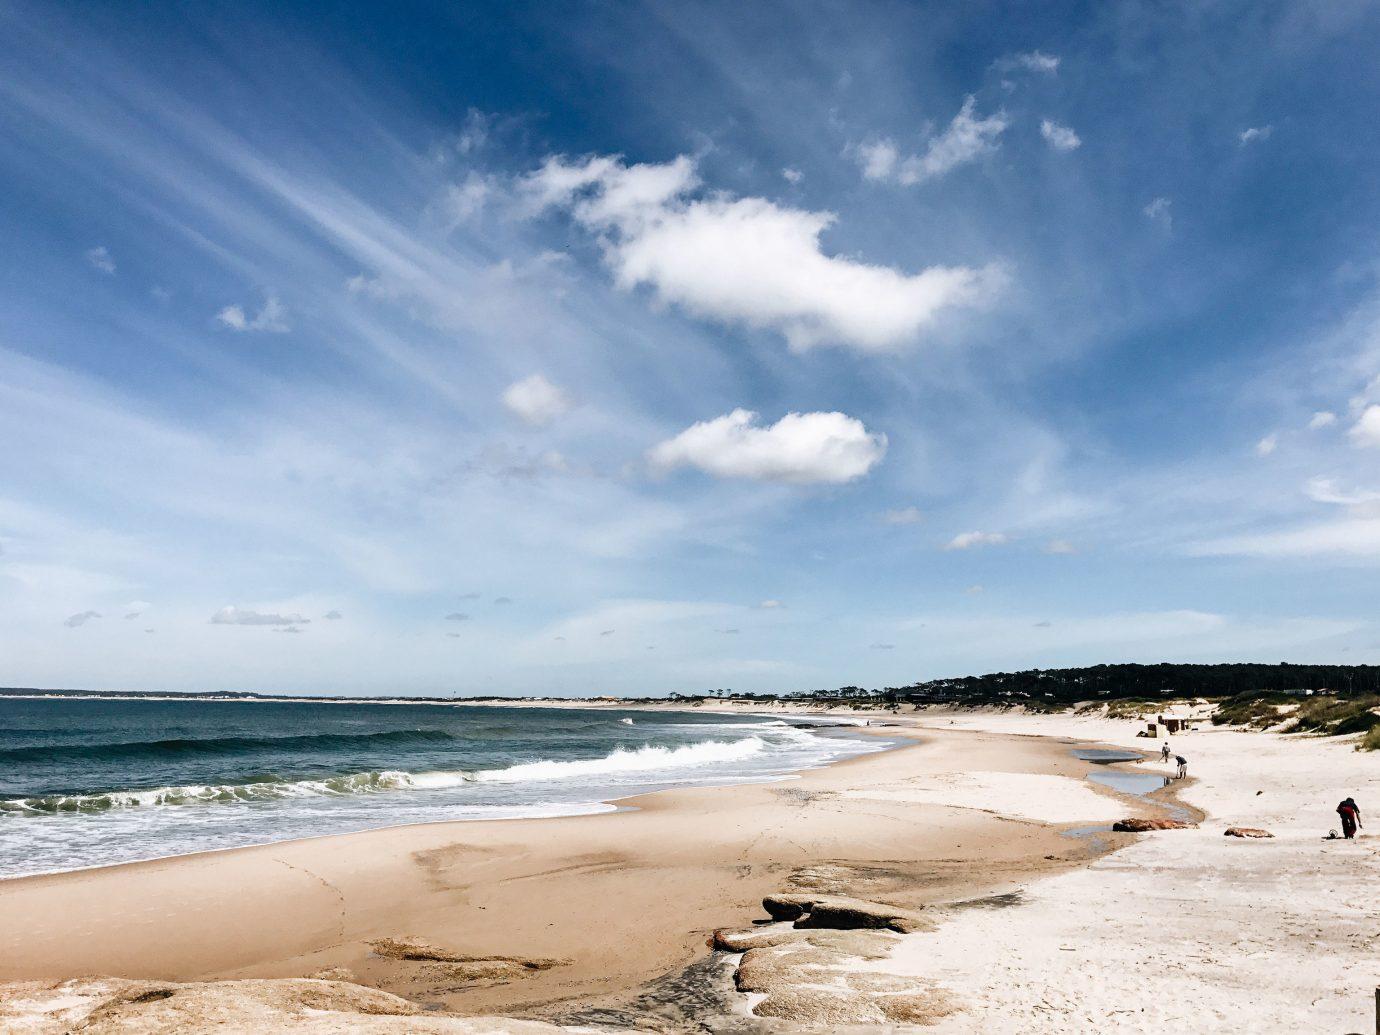 Romantic Getaways south america Trip Ideas Uruguay sky Sea cloud Beach shore coastal and oceanic landforms Coast body of water Ocean horizon water wave wind wave sand daytime meteorological phenomenon calm bay vacation tide cape